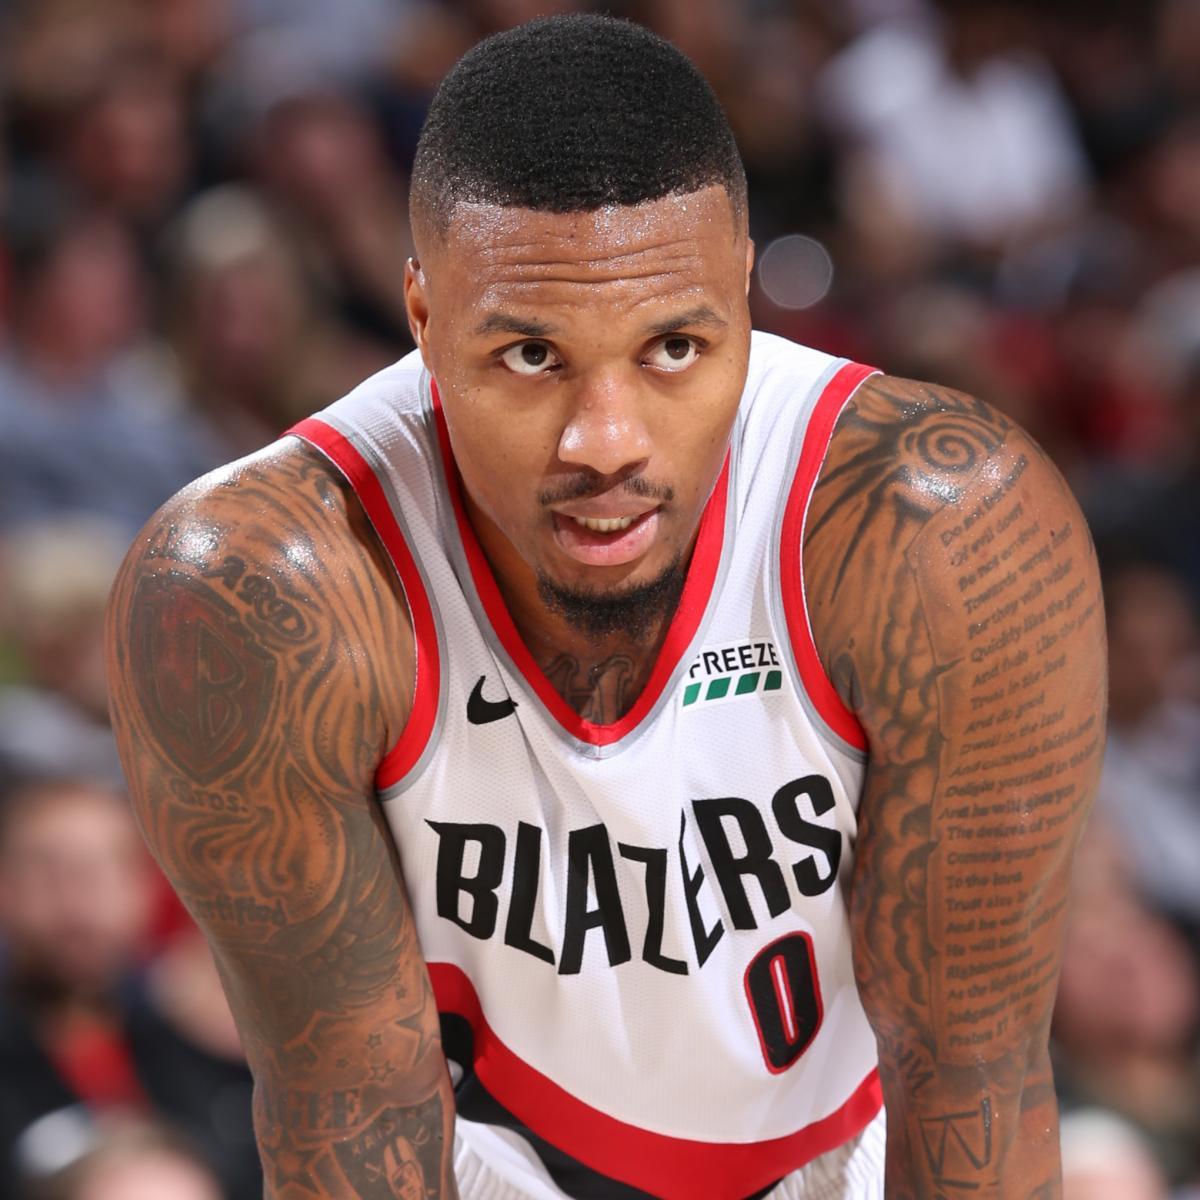 NBA Rumors: LeBron James 'Respects' Damian Lillard's Game